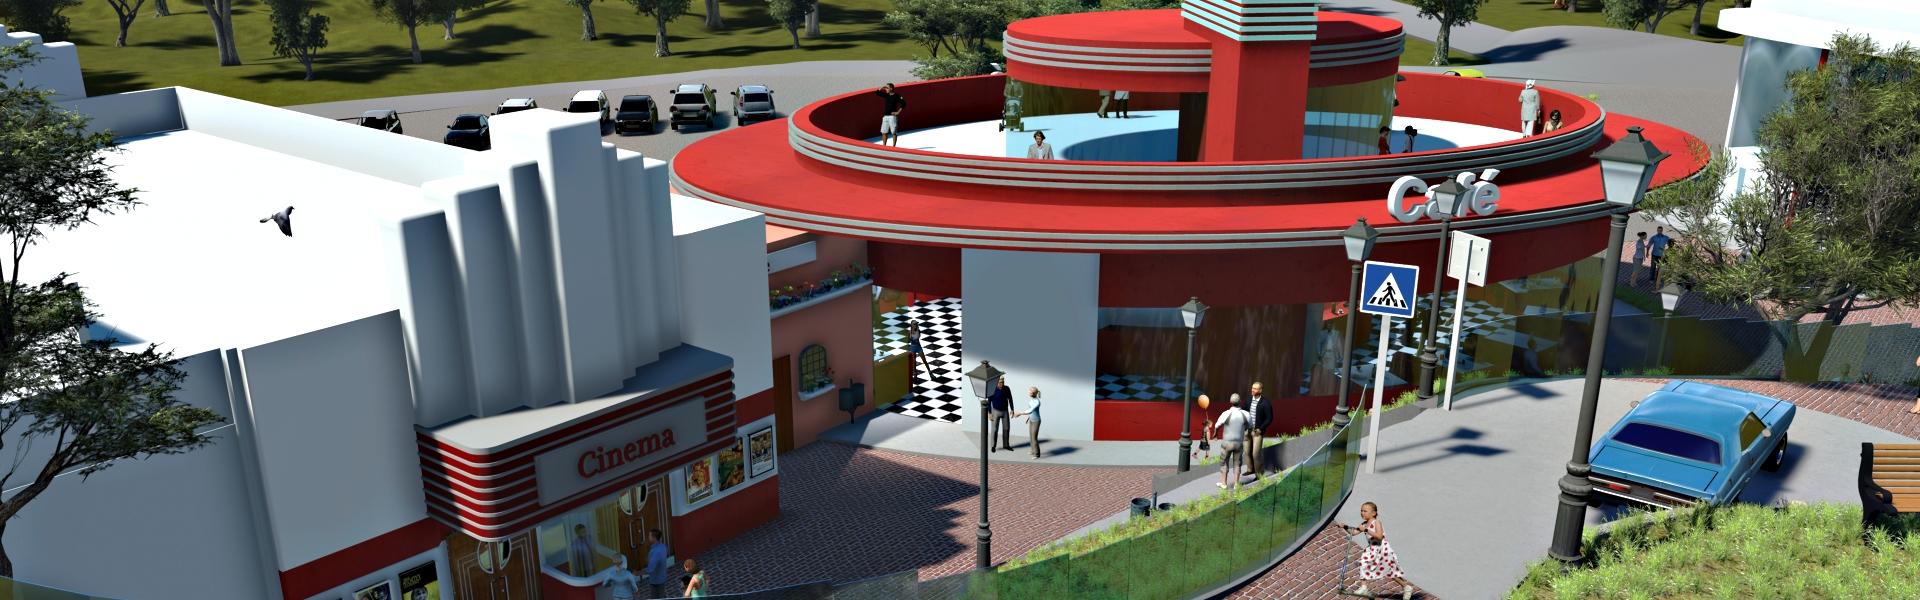 slide-projeto-museu2